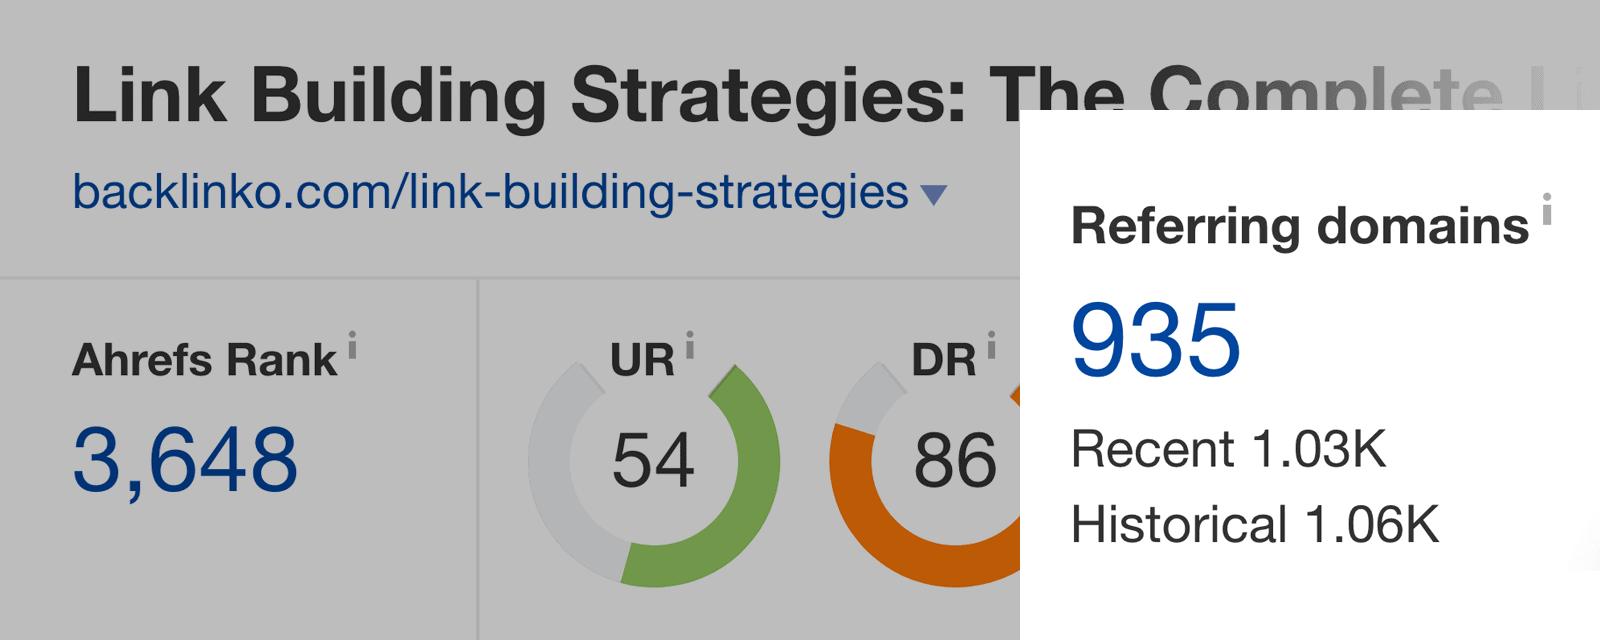 Link Building Strategies – Referring Domains